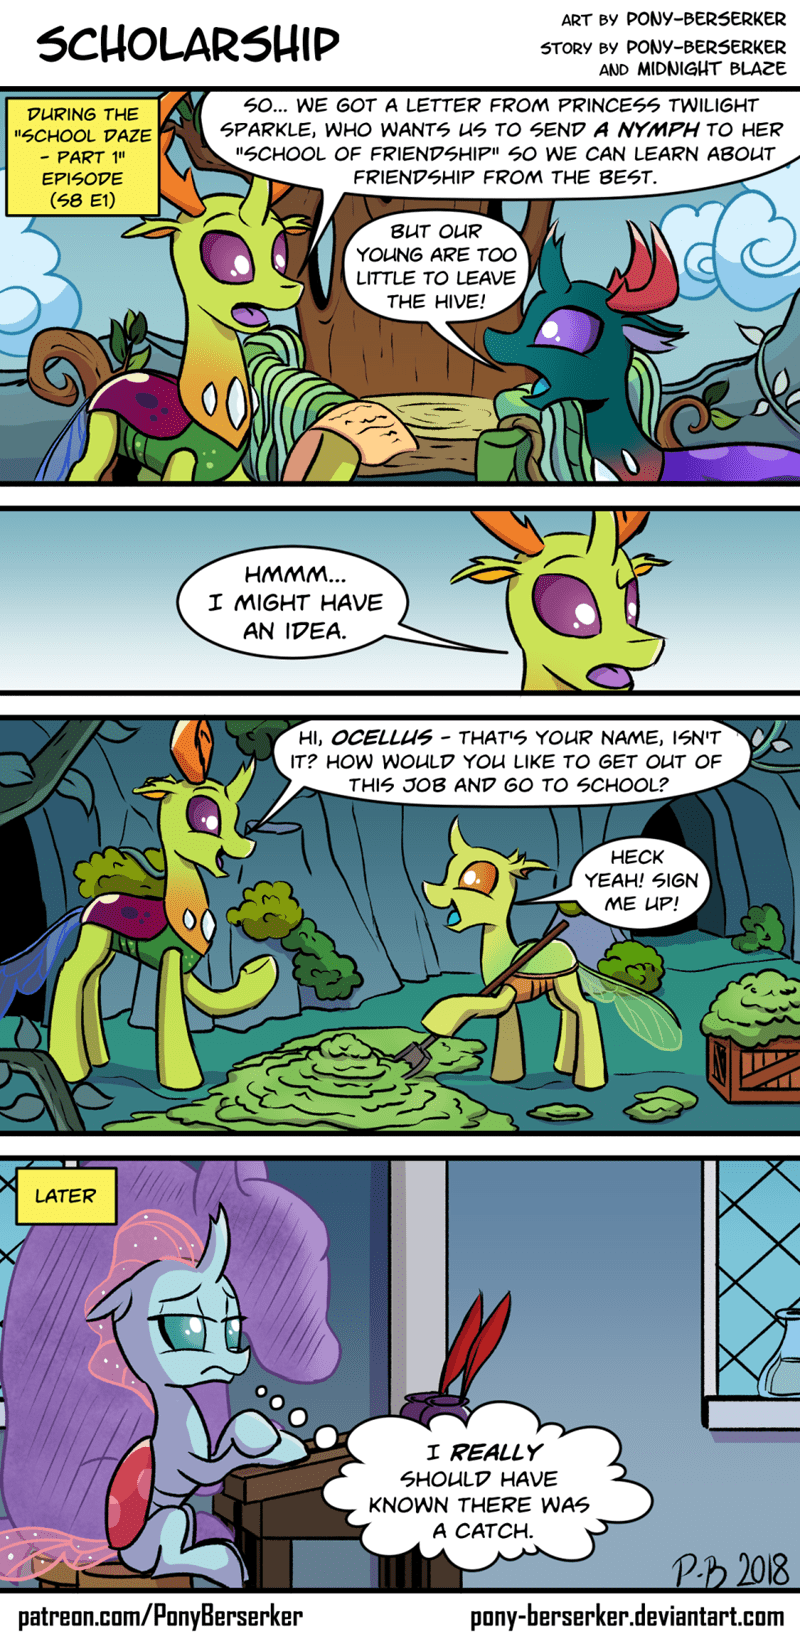 thorax pony-berserker ocellus comic school daze changelings - 9150477824